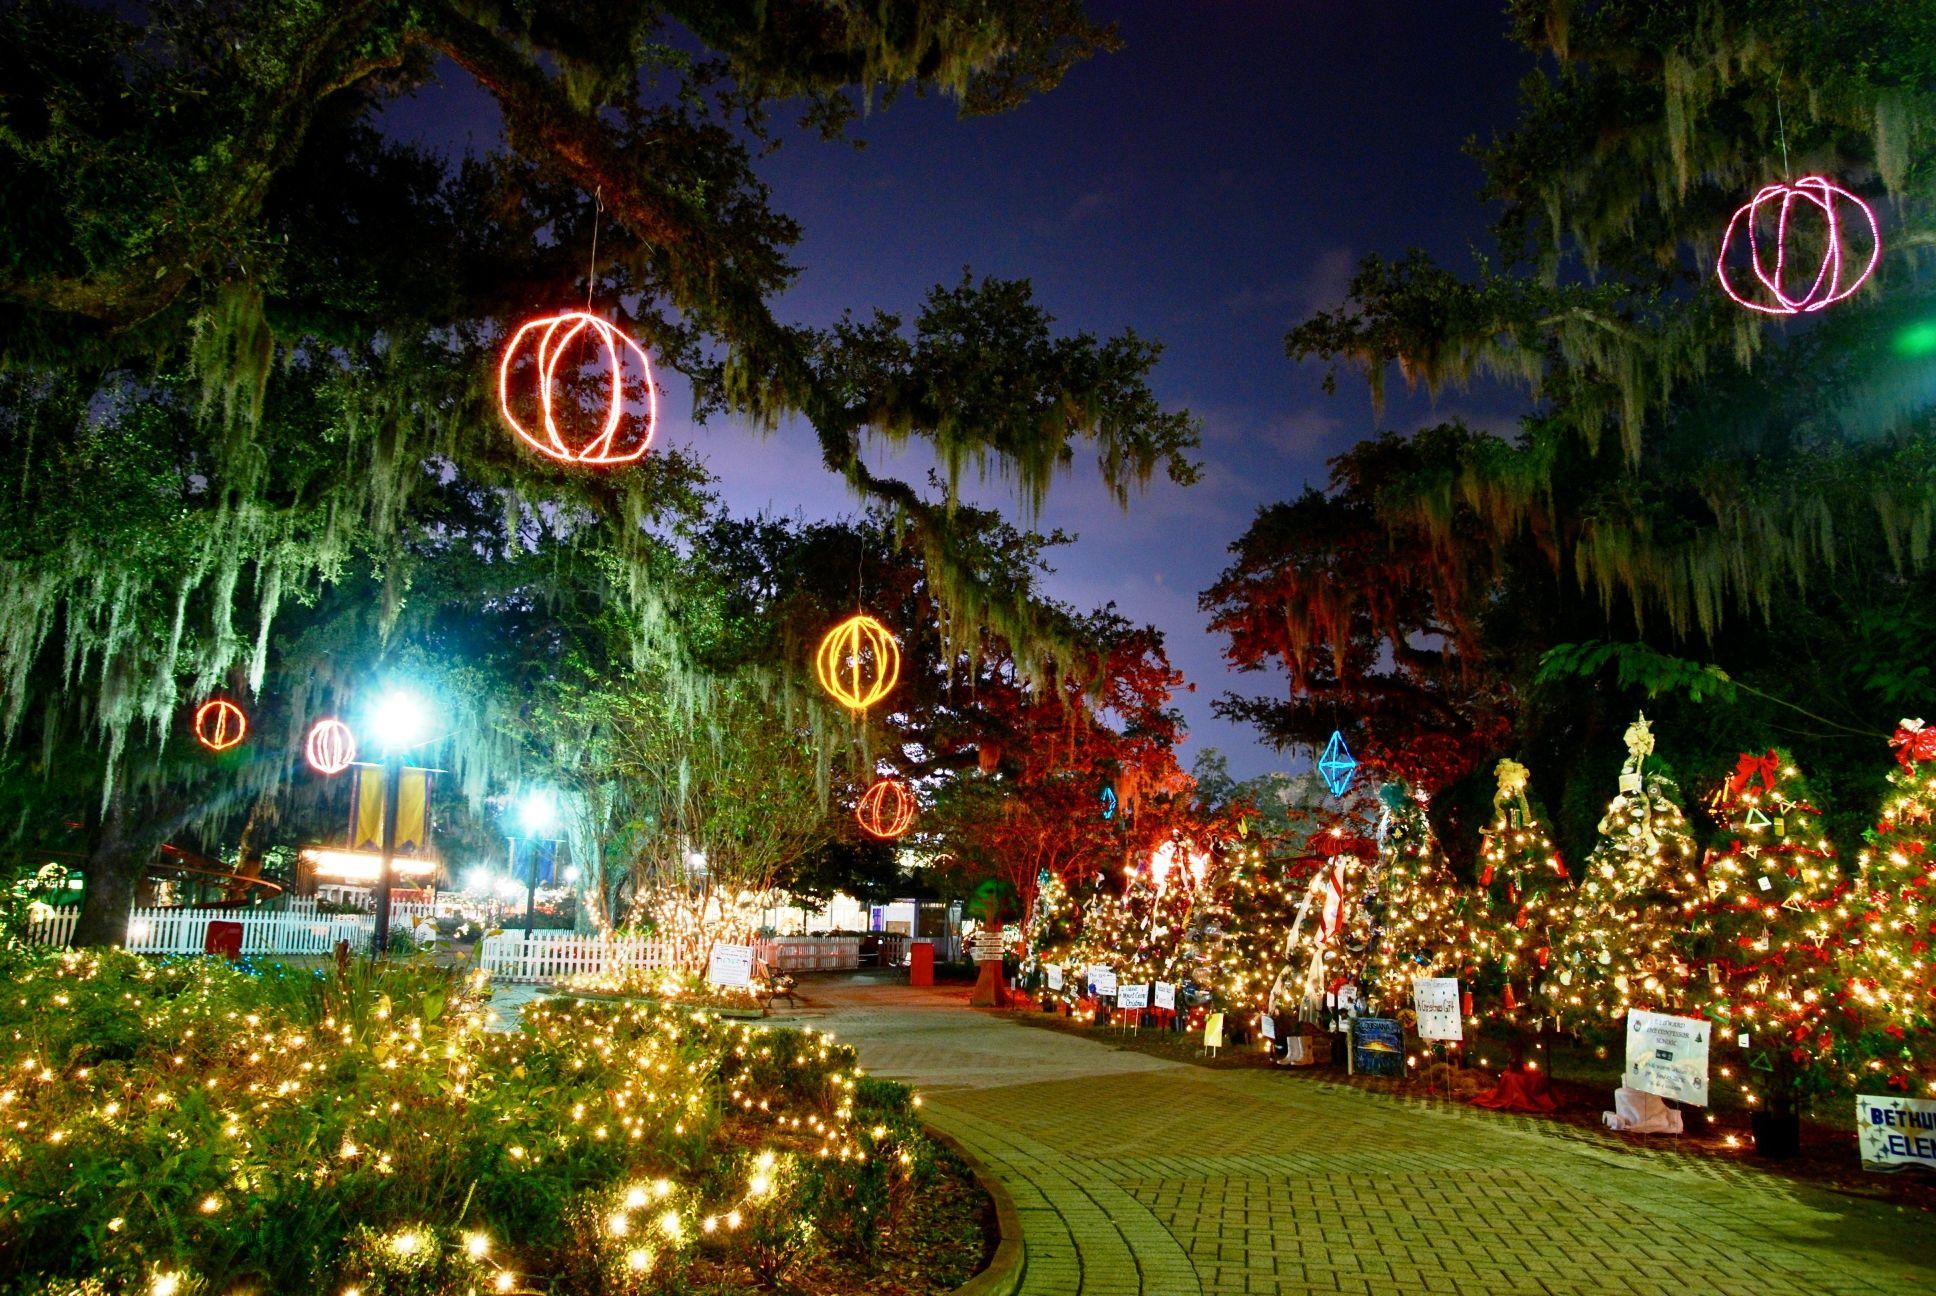 the oaks in city park new orleans celebration in the oaks city parks winter wonderland southern new orleans the big easy pinterest - Celebration Christmas Lights